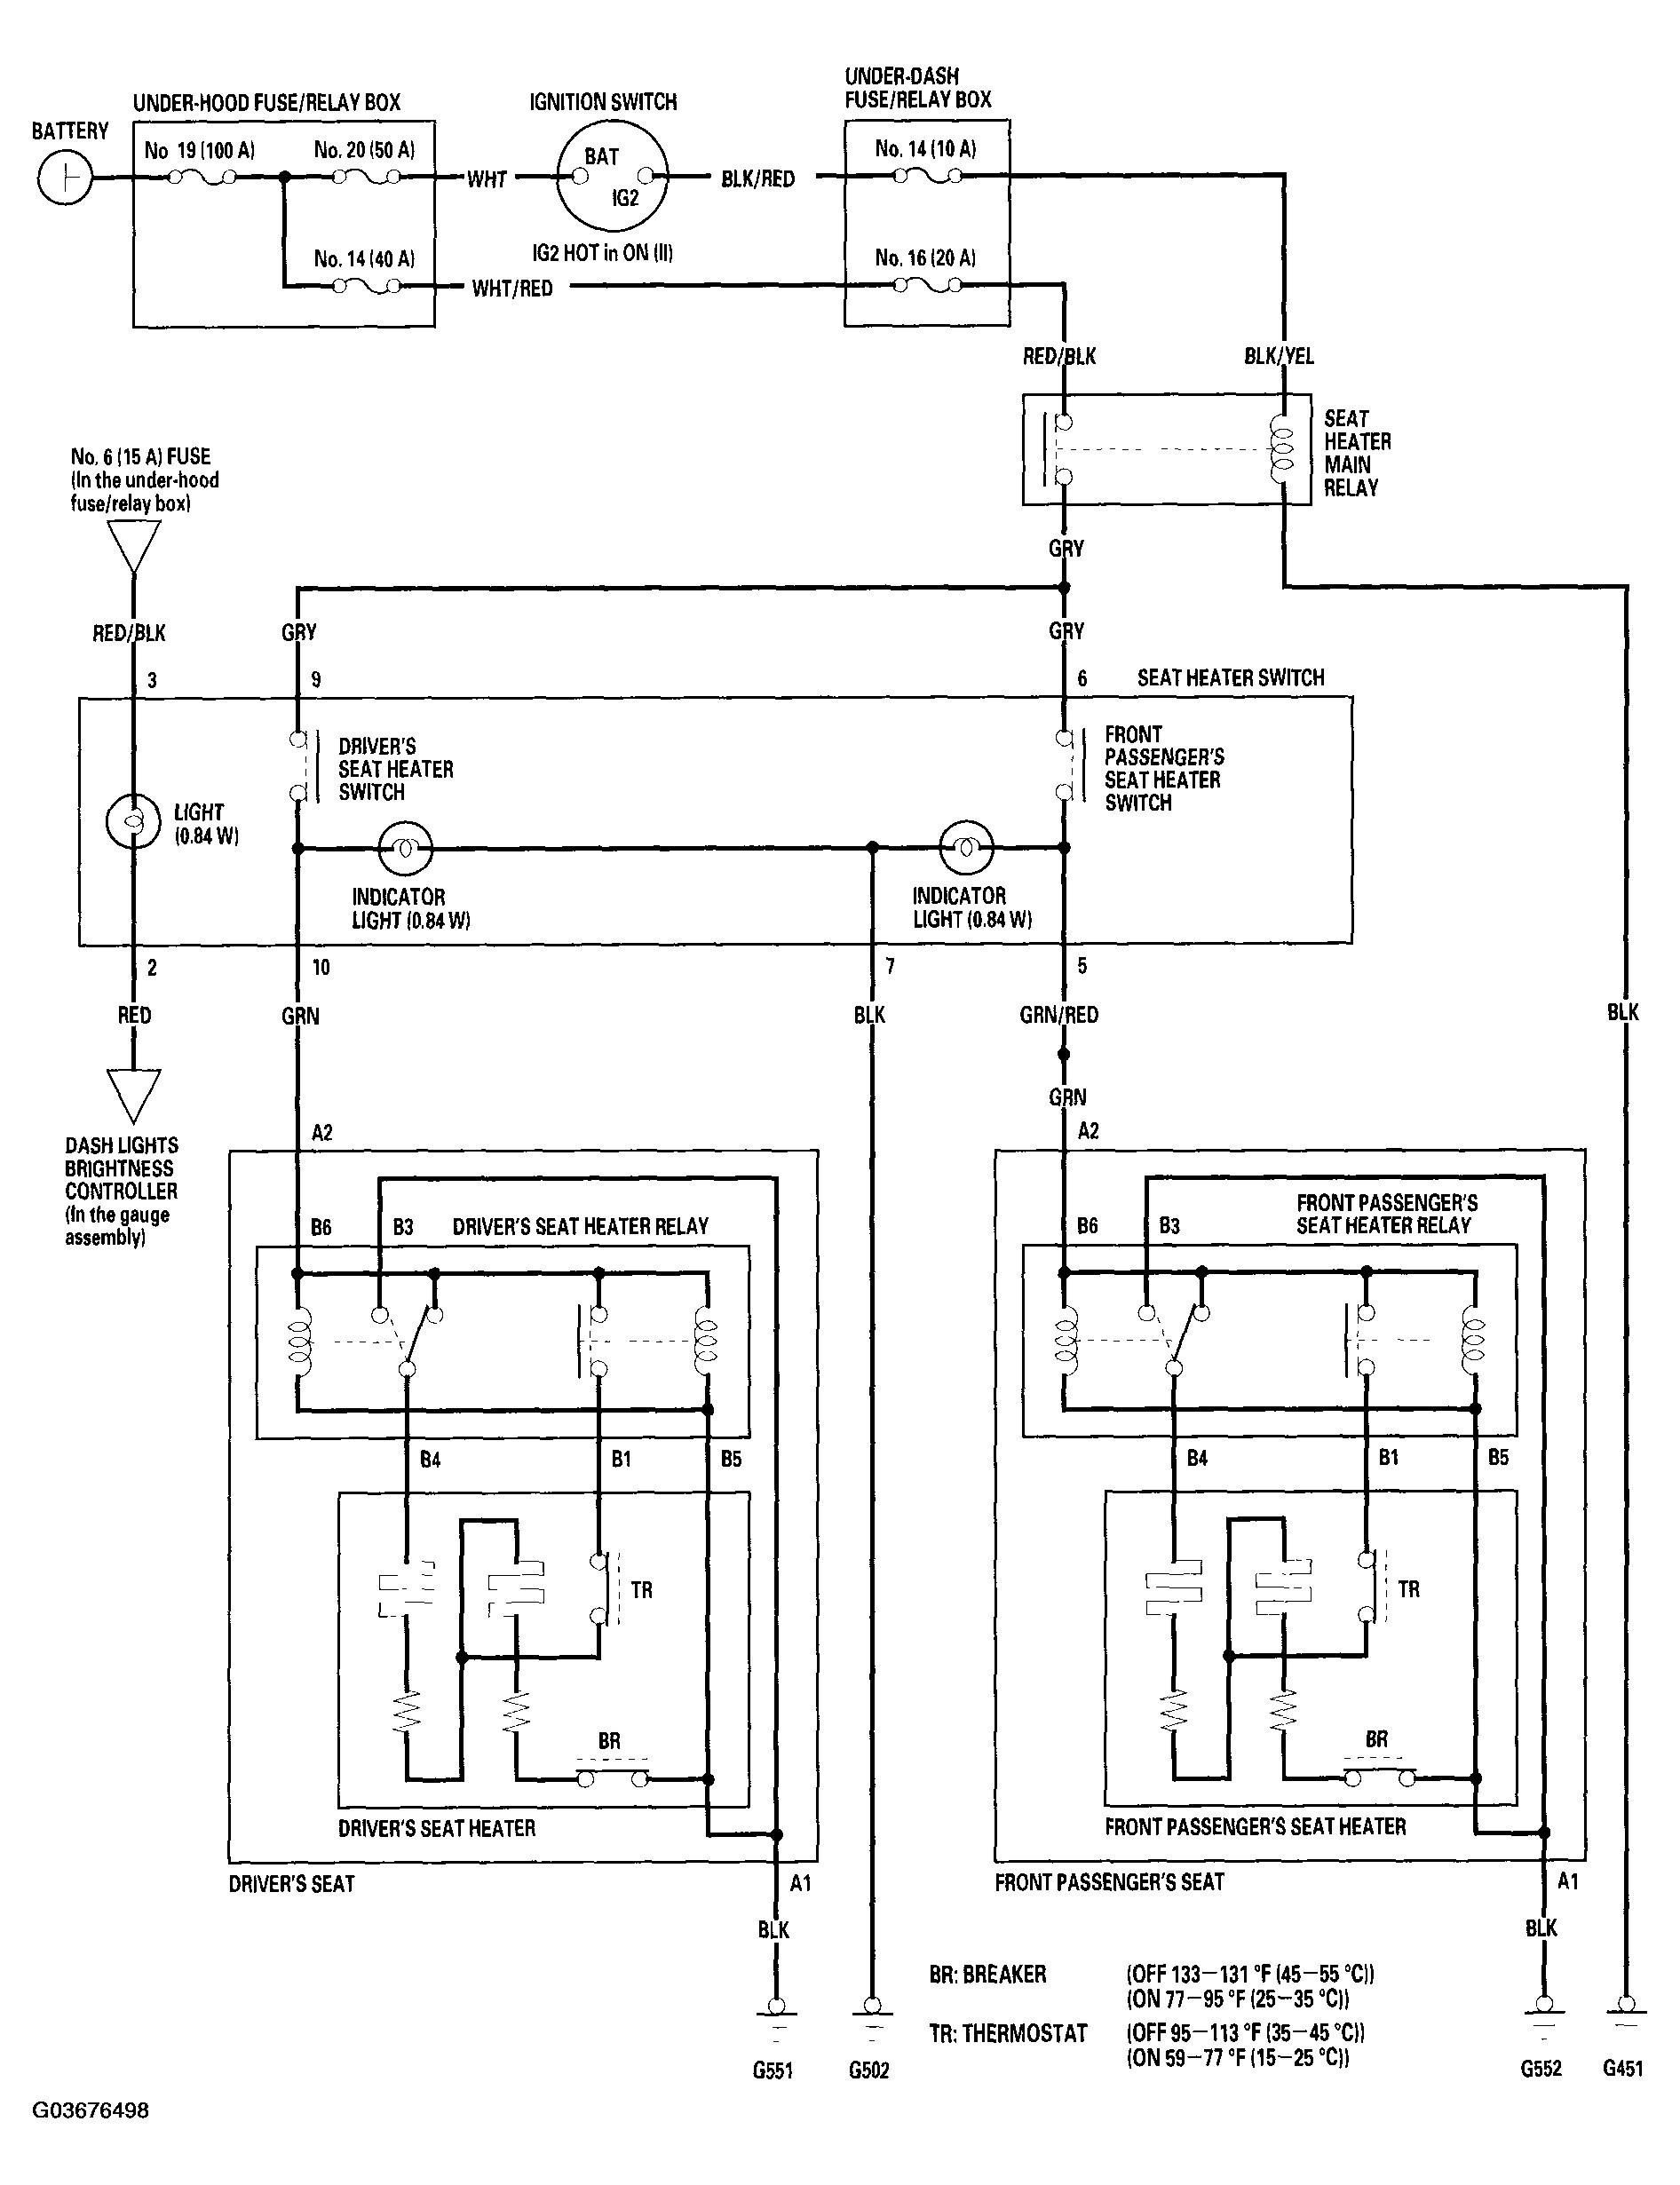 2006 Honda Civic Engine Diagram Best 2006 Honda Civic Relay Diagram • Electrical Outlet Symbol 2018 Of 2006 Honda Civic Engine Diagram